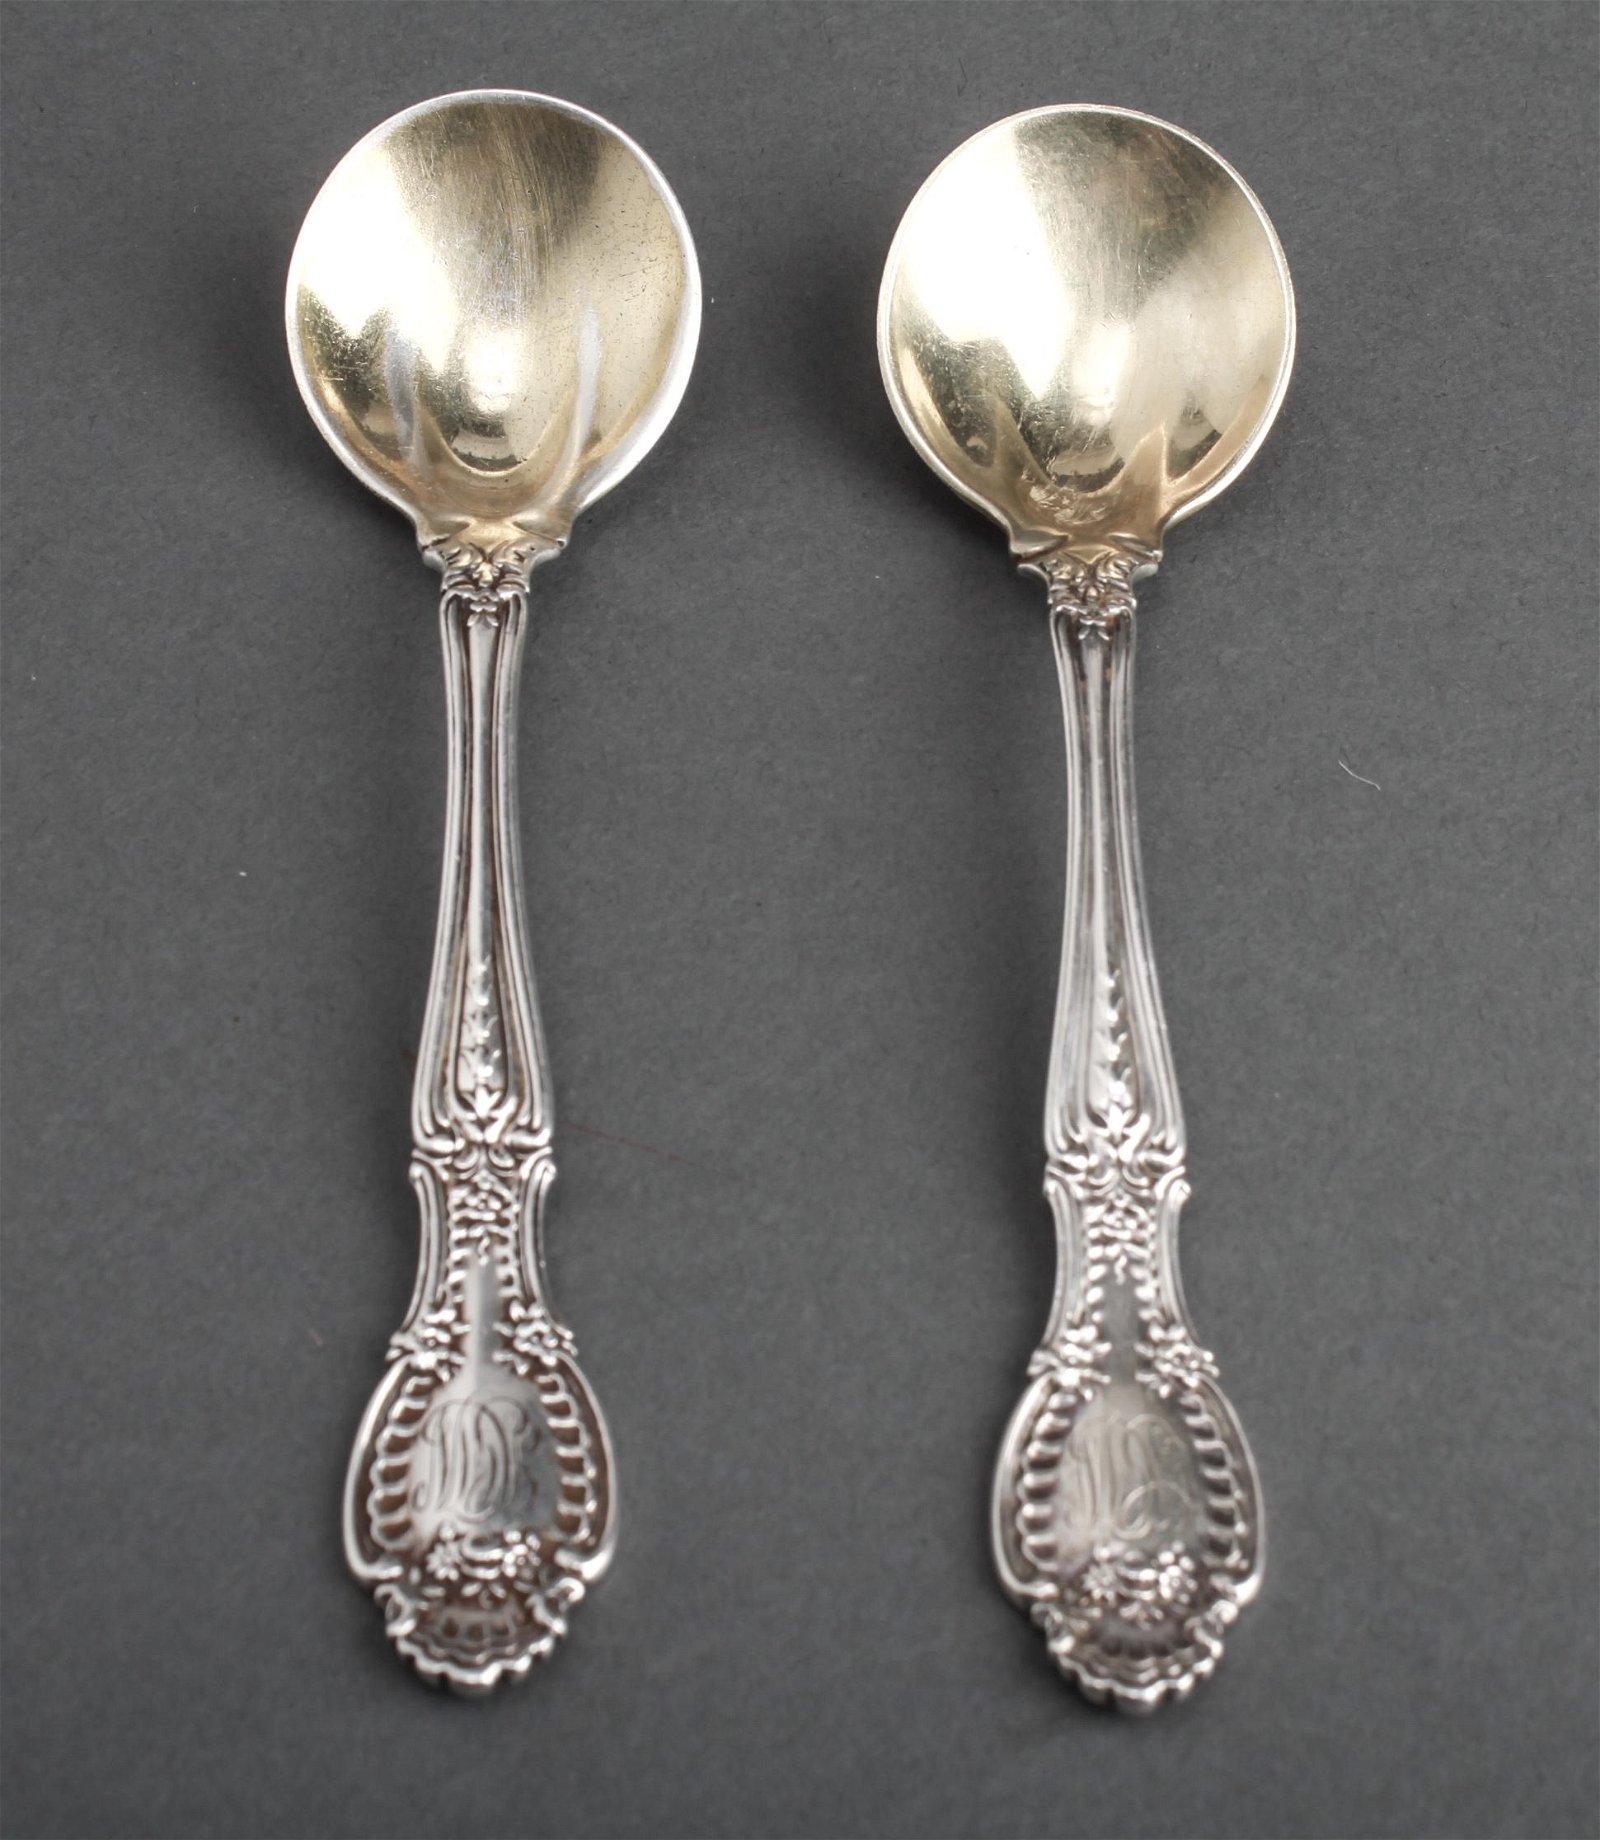 Tiffany & Co. Richelieu Cream Soup Spoons, 2